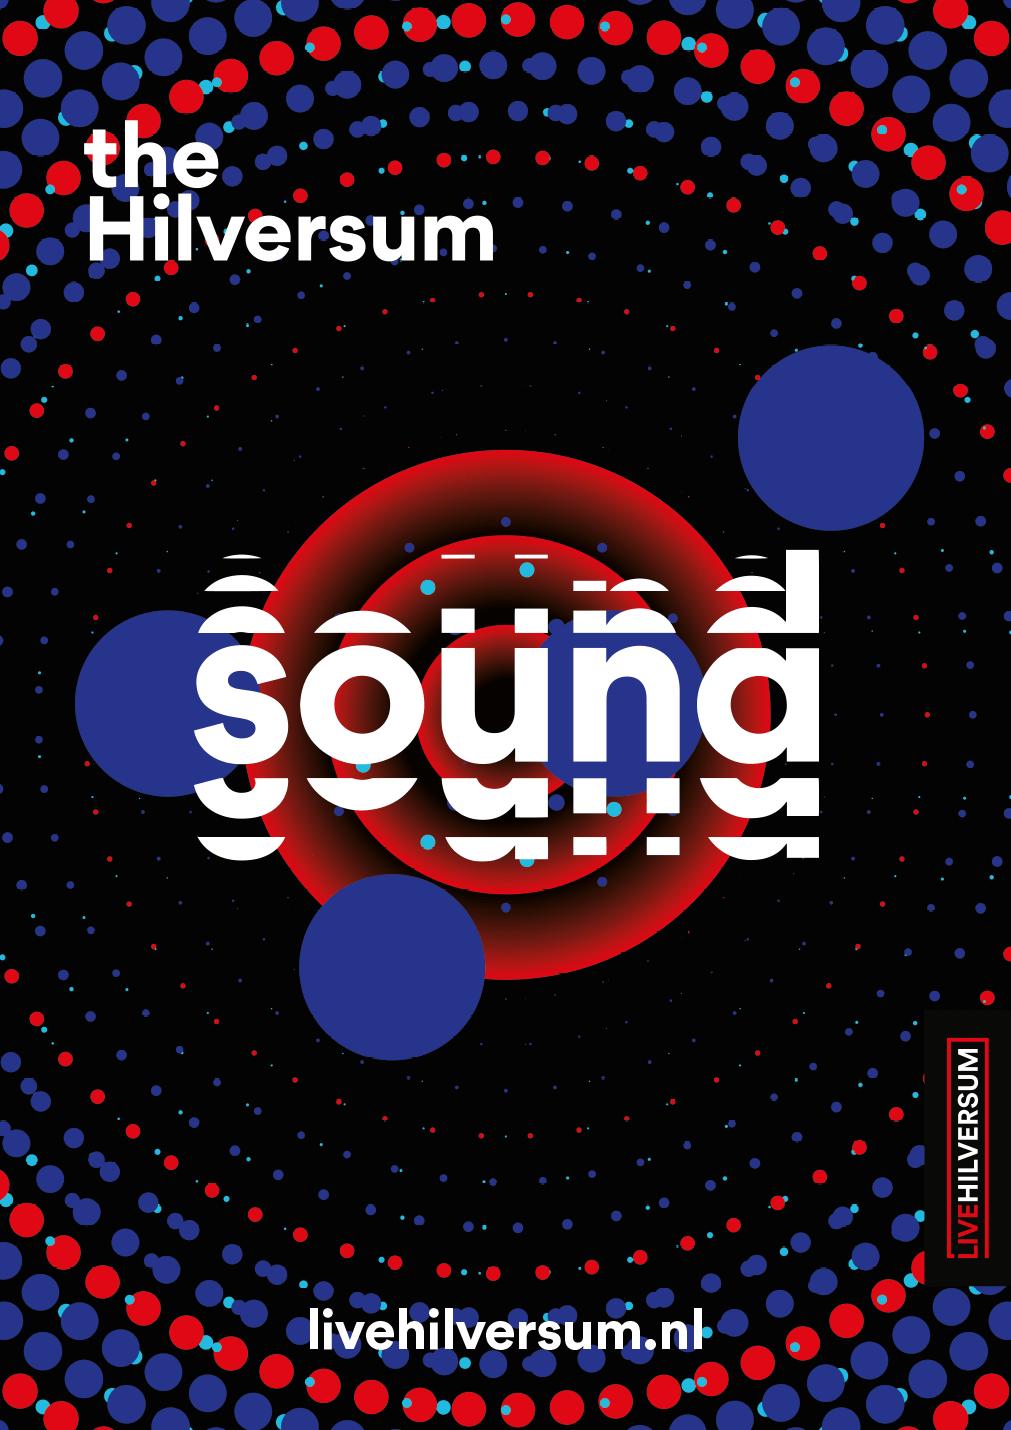 TheHilversumSound_4